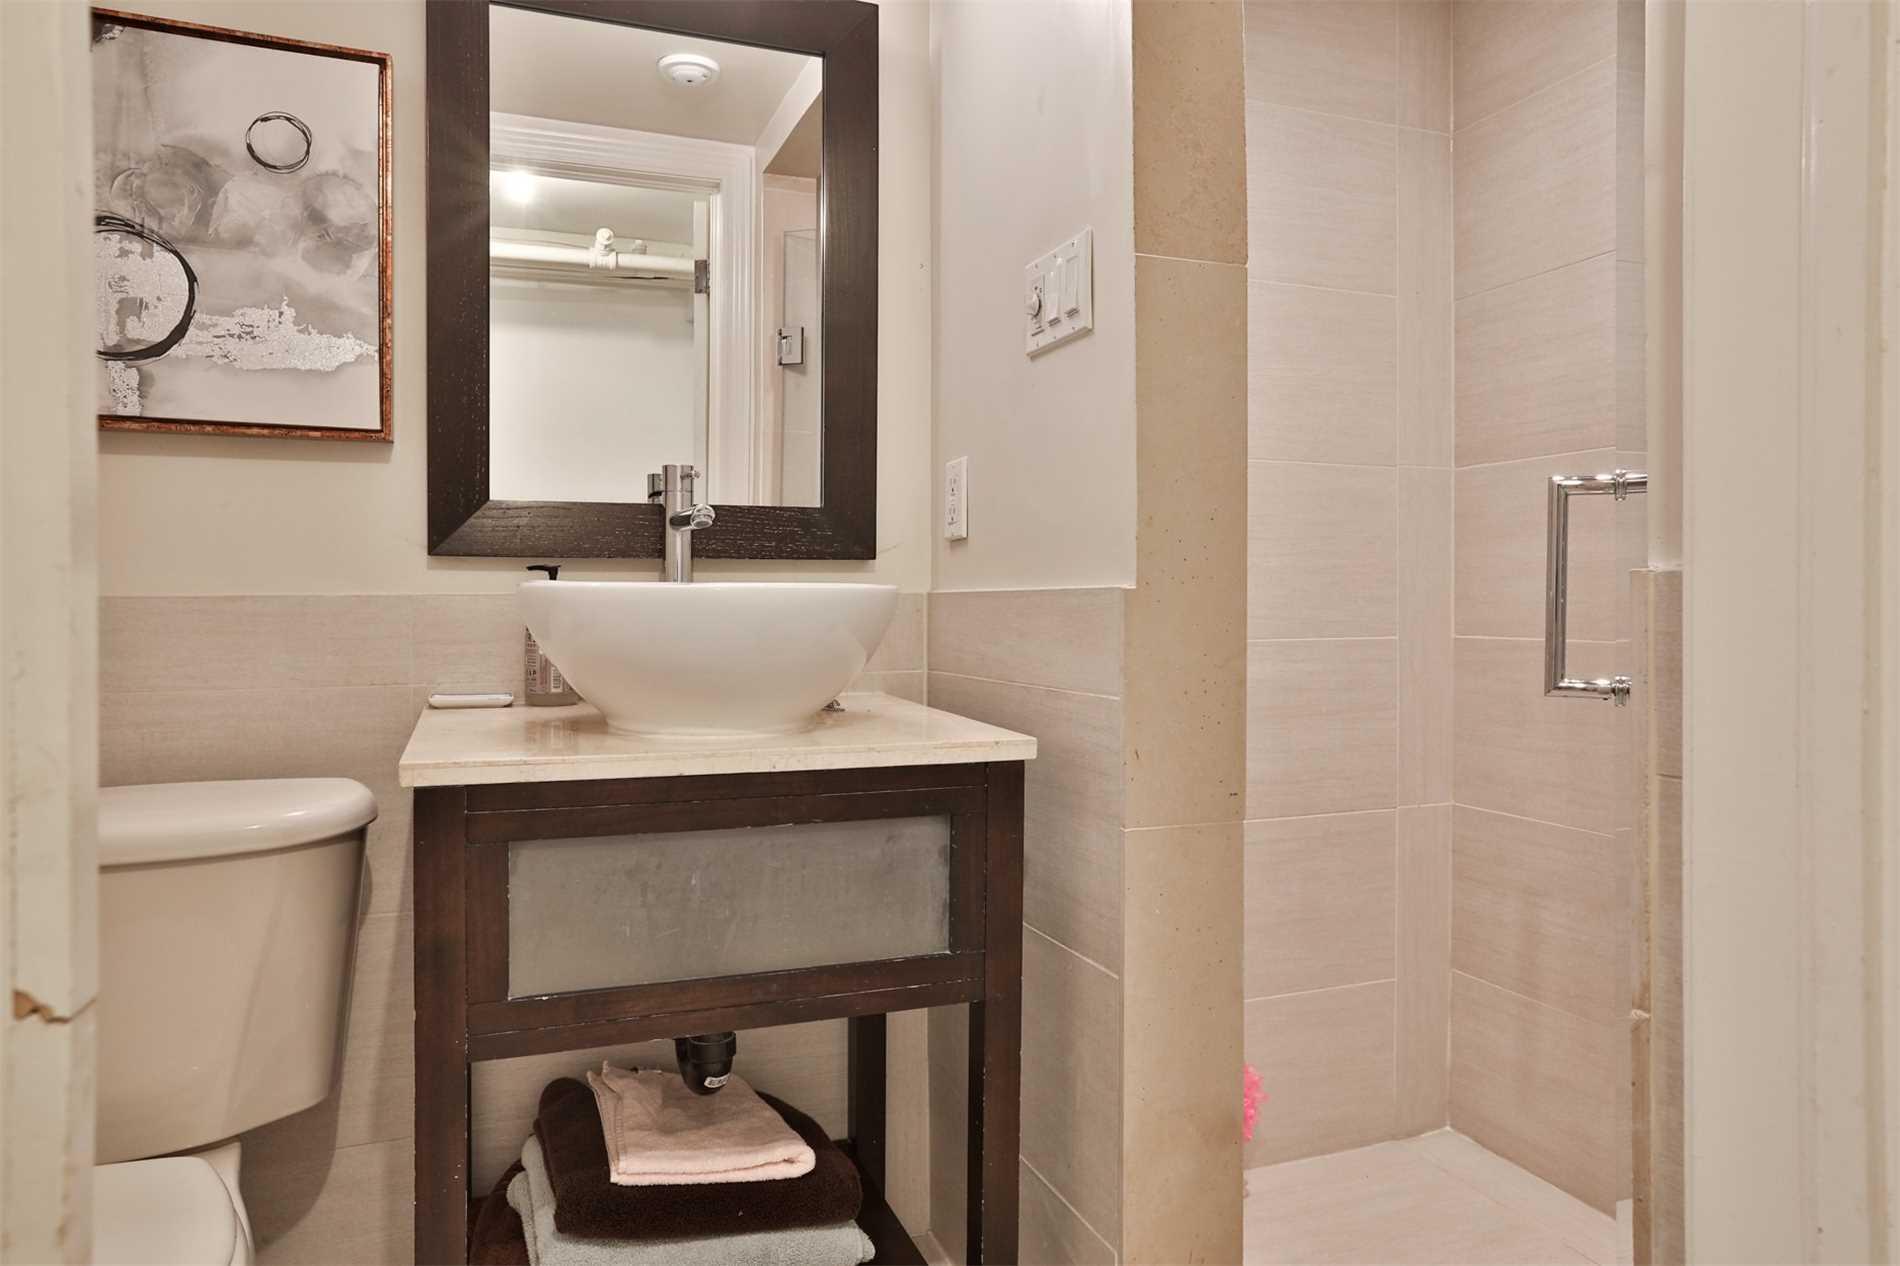 216 Poplar Plains Rd, Toronto, Ontario M4V2N6, 4 Bedrooms Bedrooms, 10 Rooms Rooms,3 BathroomsBathrooms,Semi-Detached,For Sale,Poplar Plains,C5362355